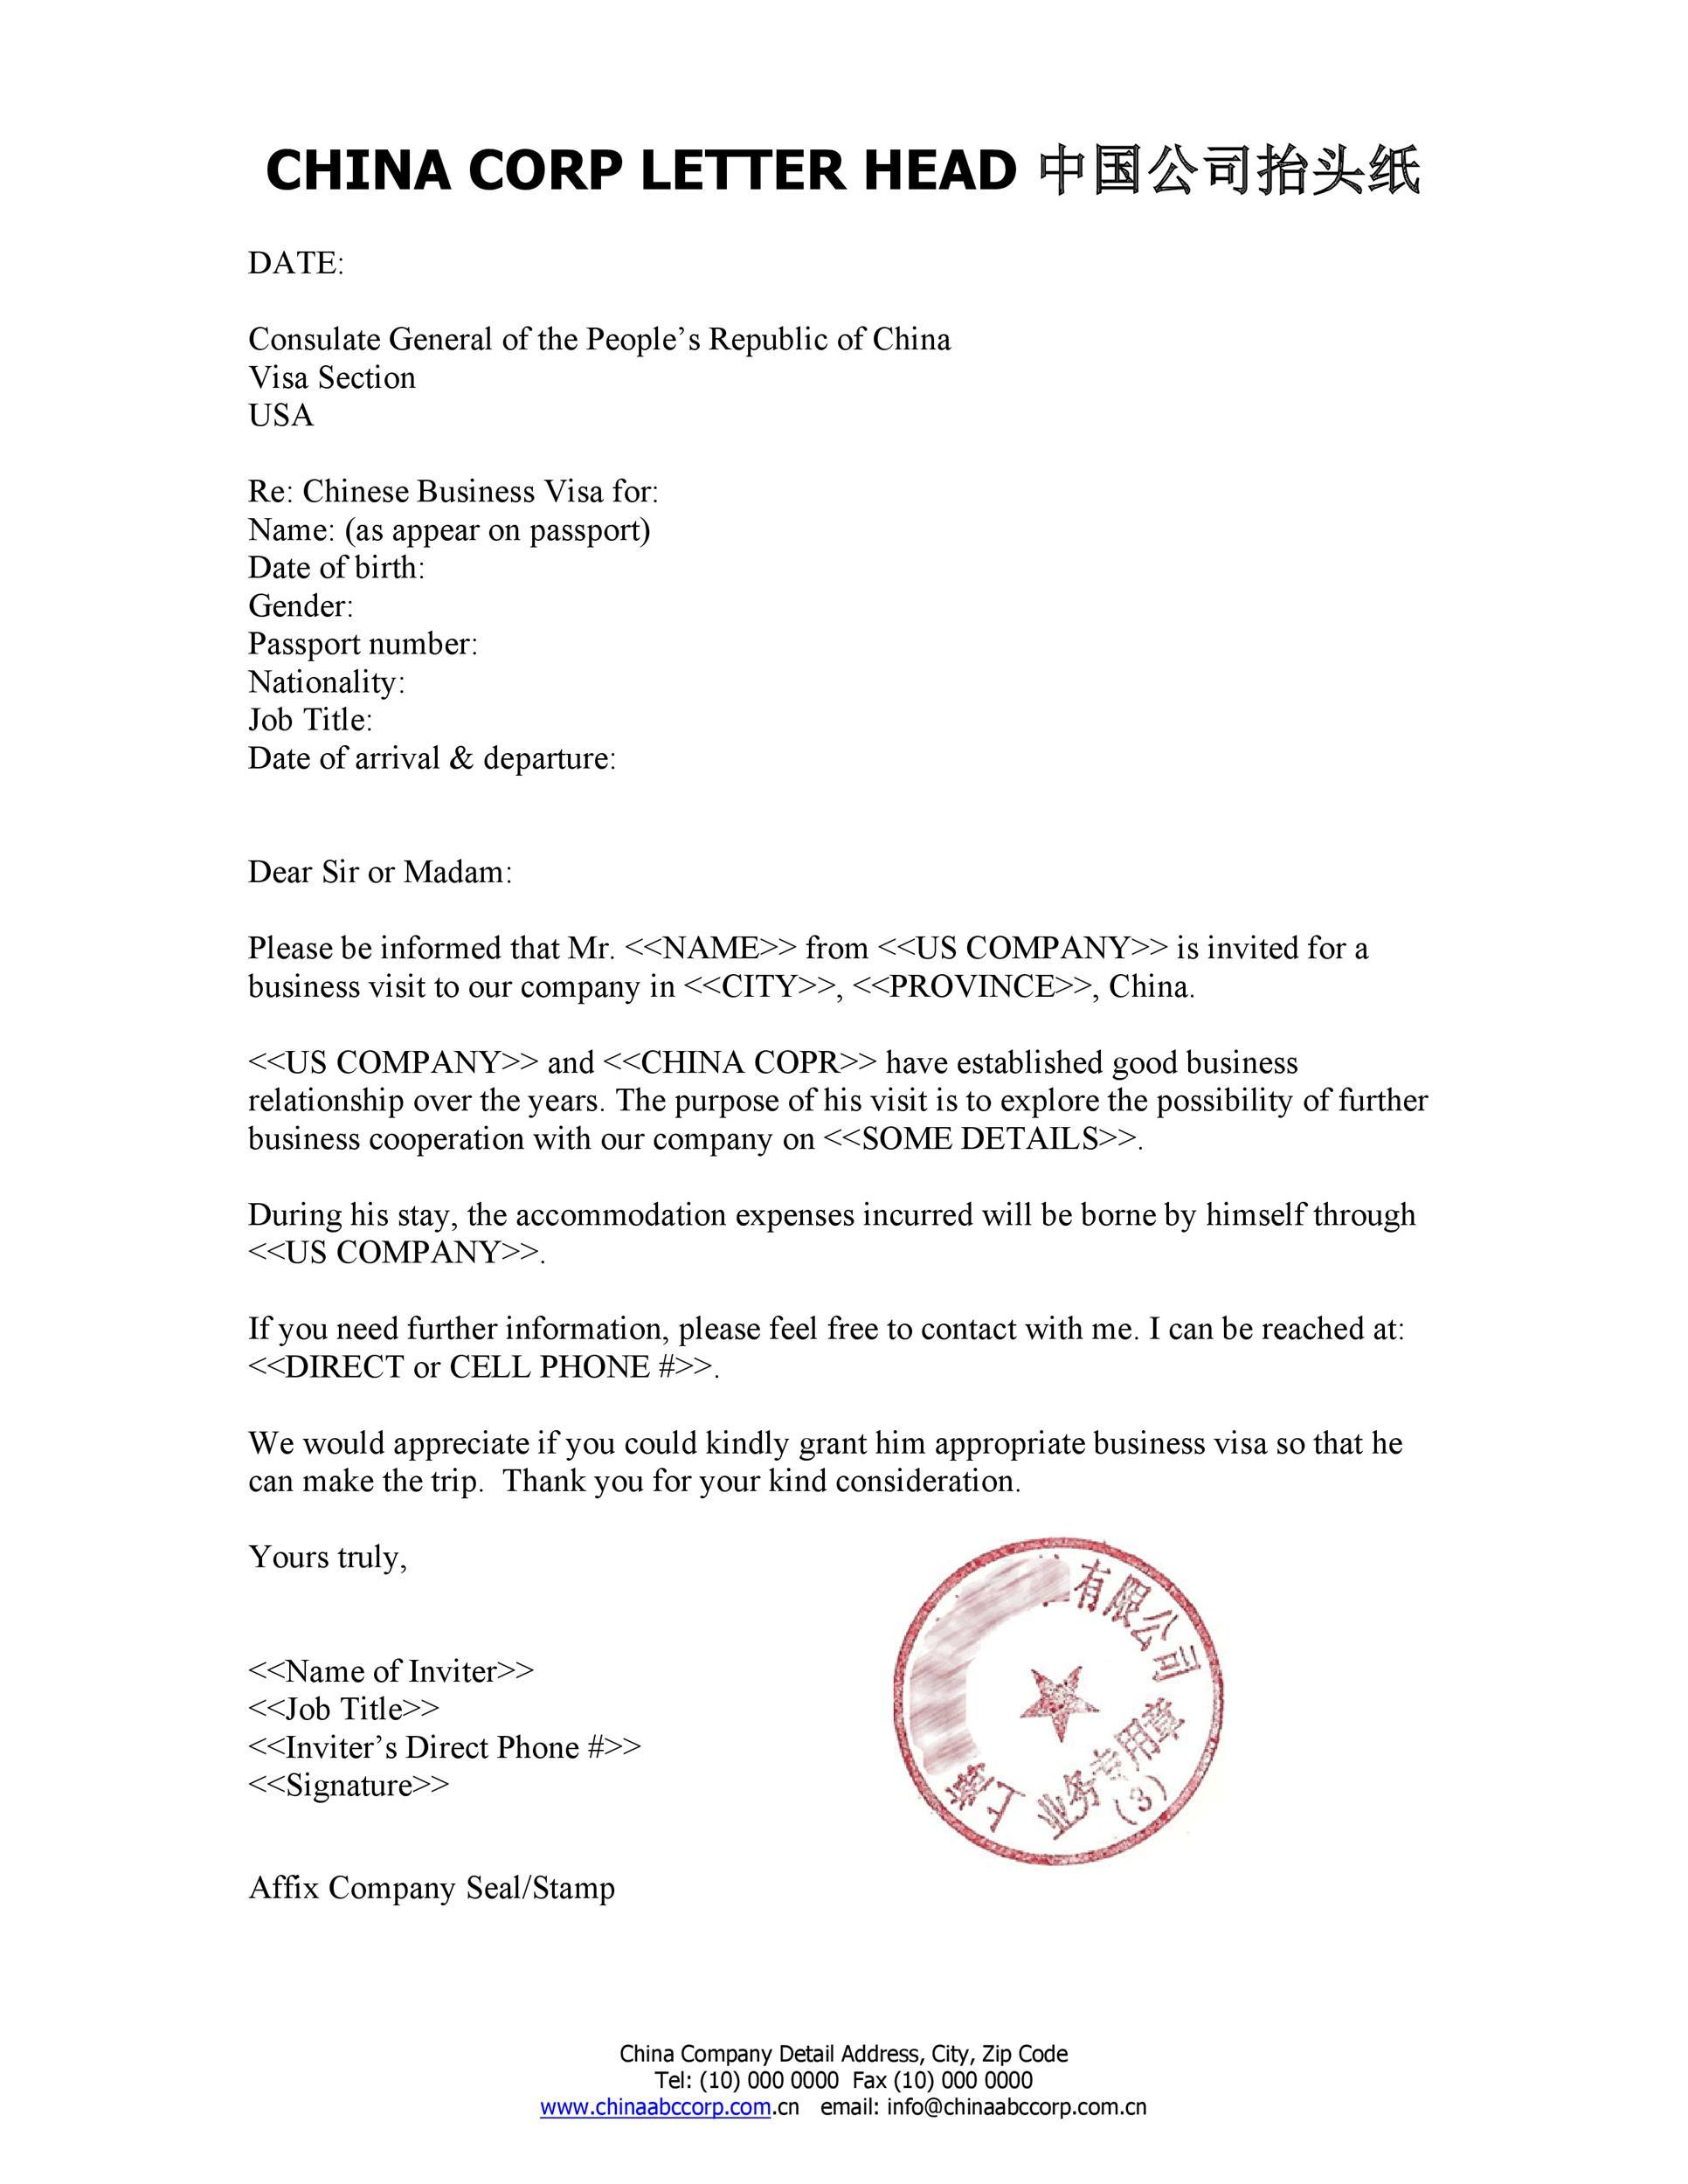 Sample Invitation Letter For Visa Application from templatelab.com